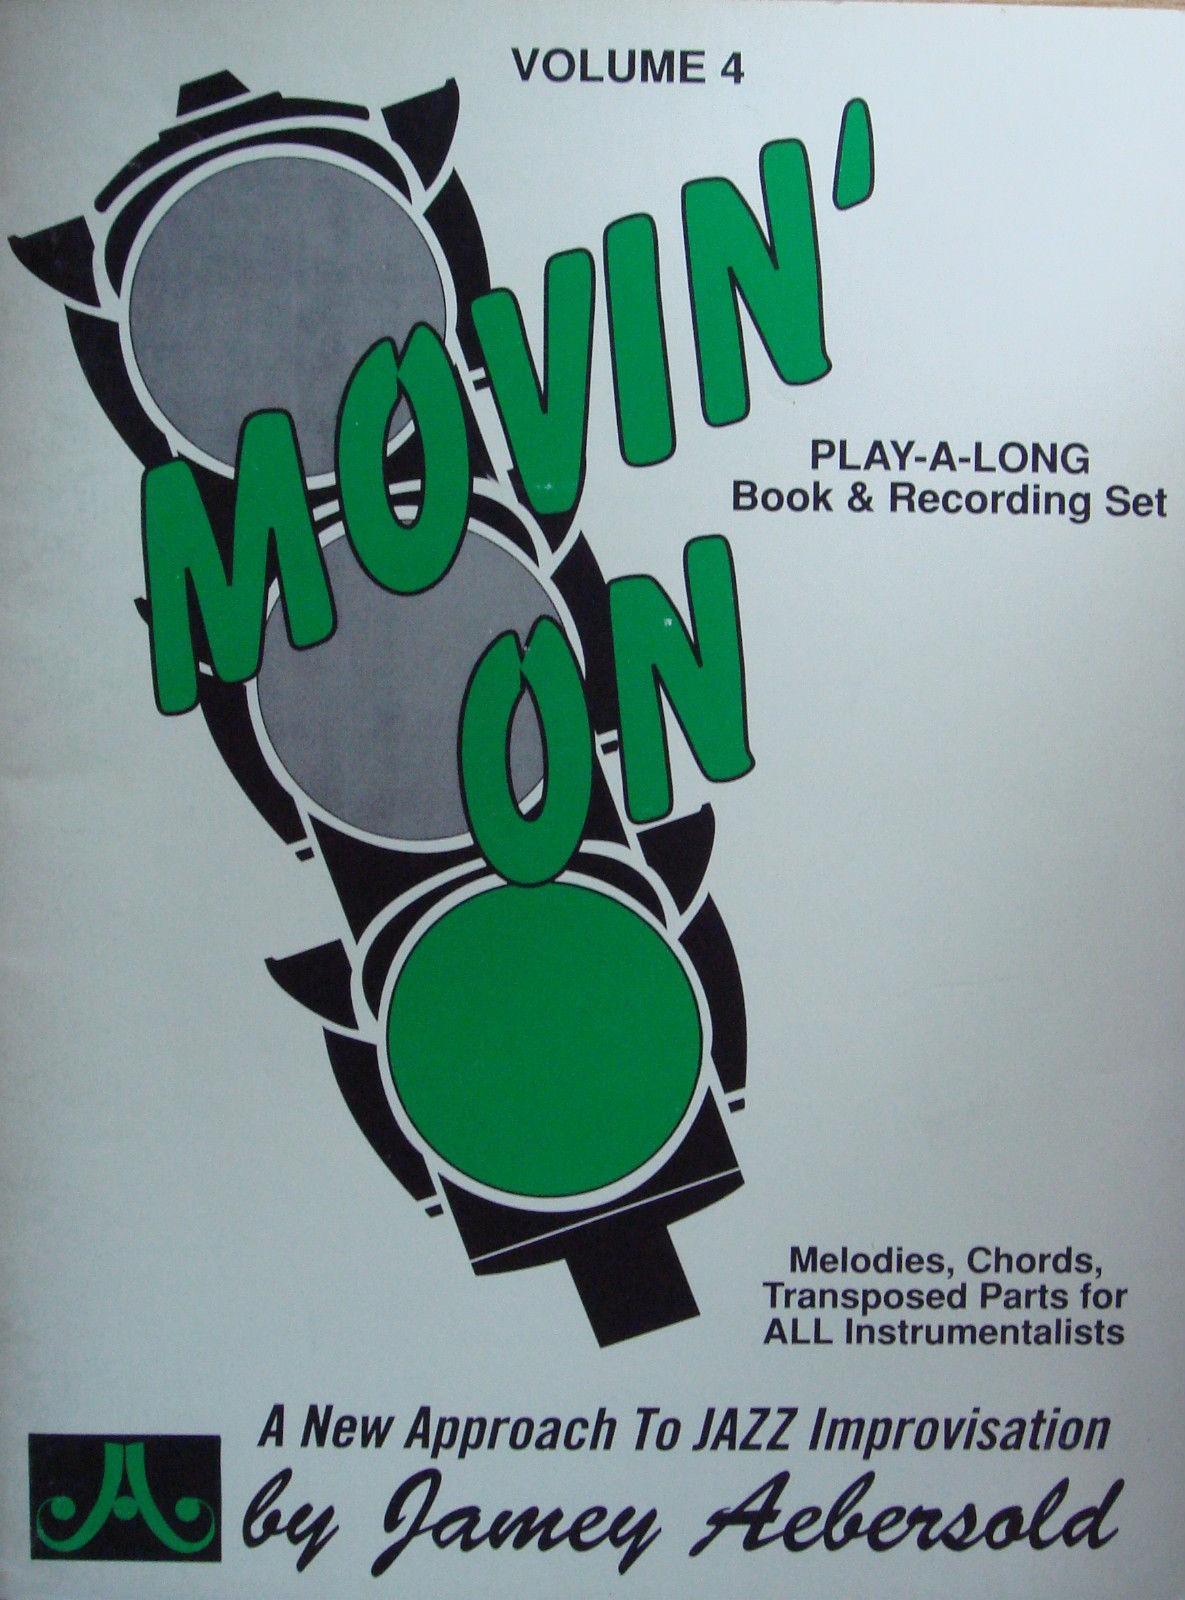 Movin' On Jazz Improvisation Tutor Music Book Practice Sheet Music Aebersold B84